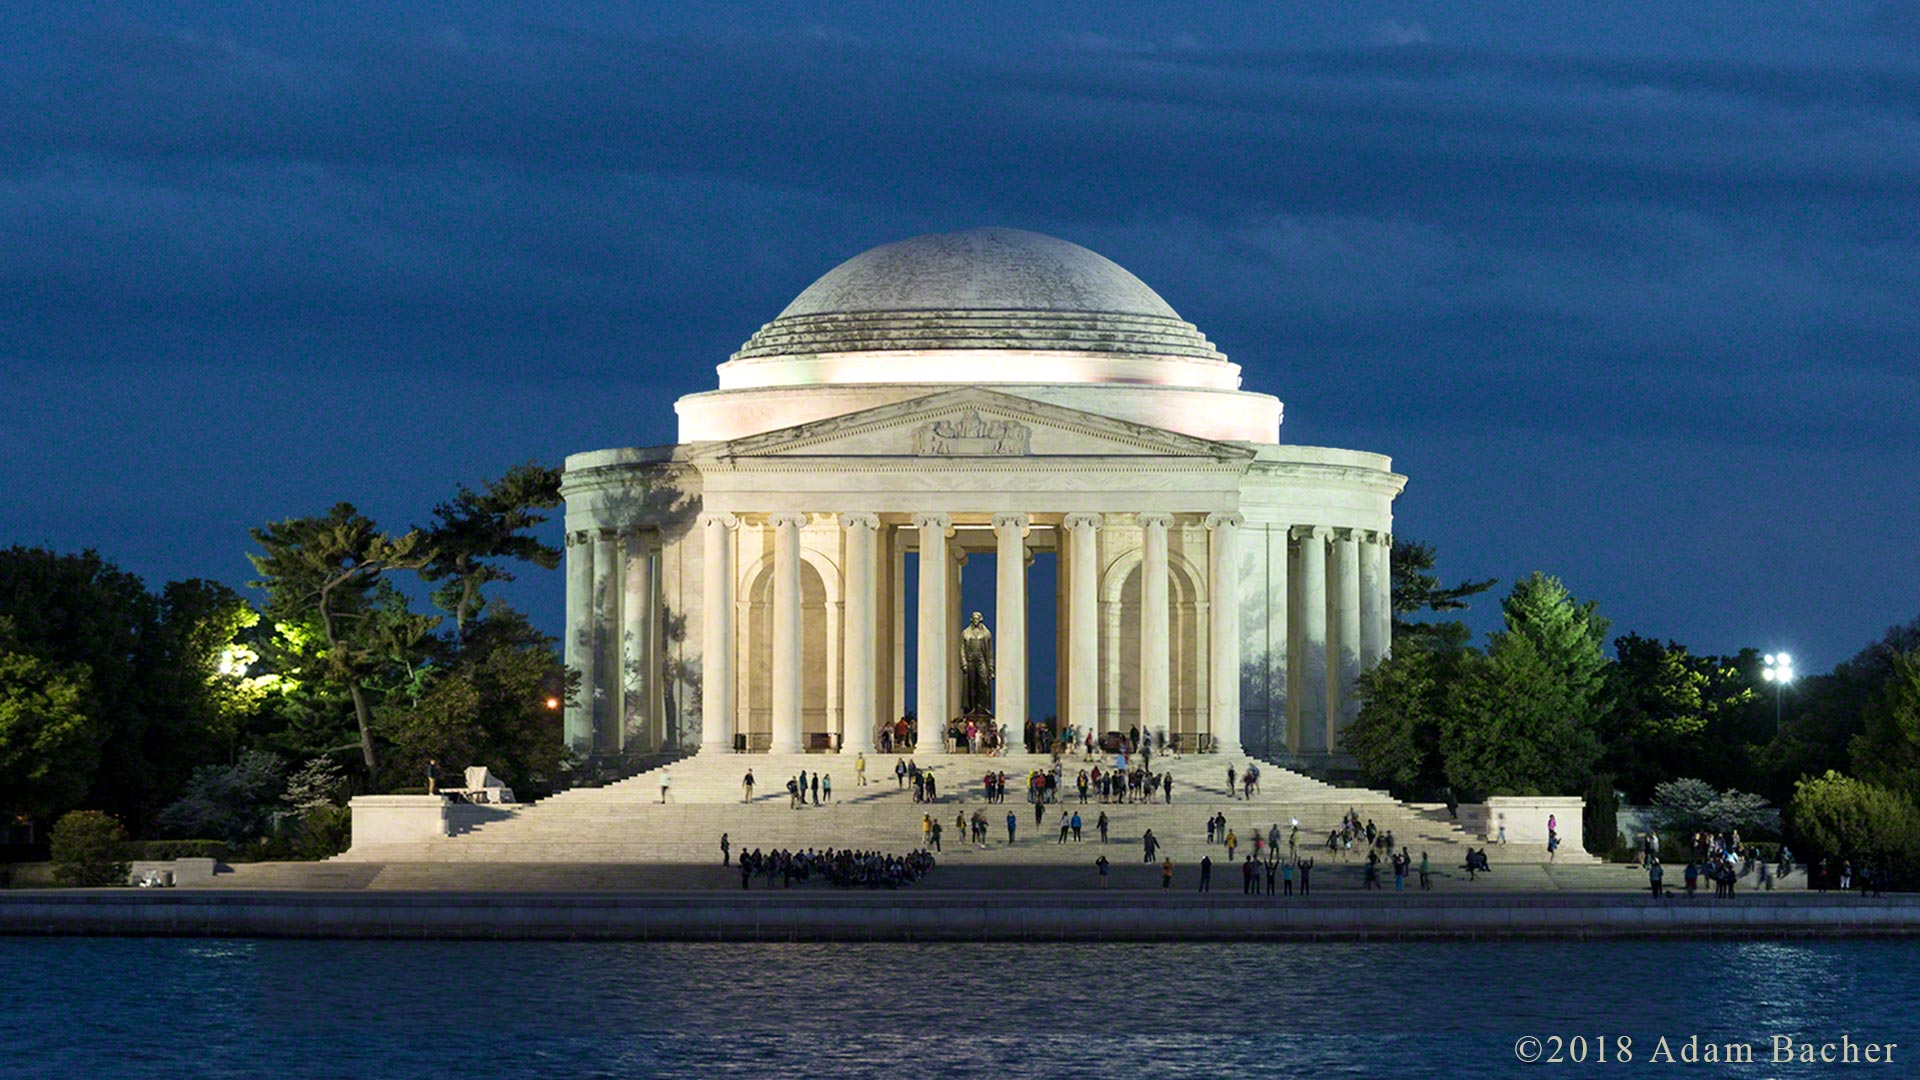 Jefferson memorial at night, Washington, DC